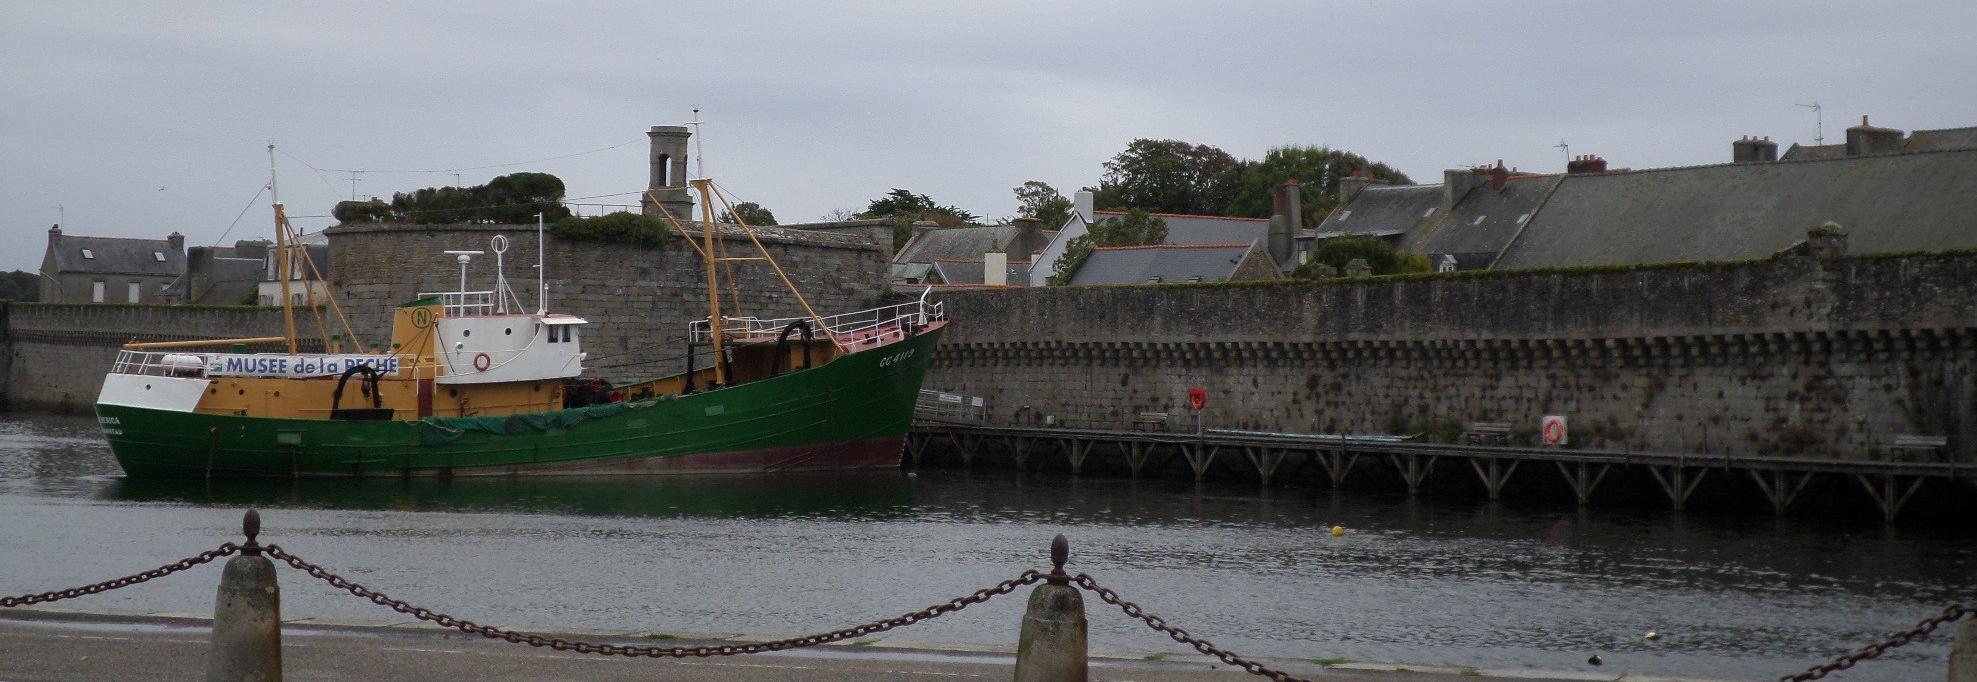 concarneau-to-ville-close-and-boat-hermione-mu-de-la-peche-oct14